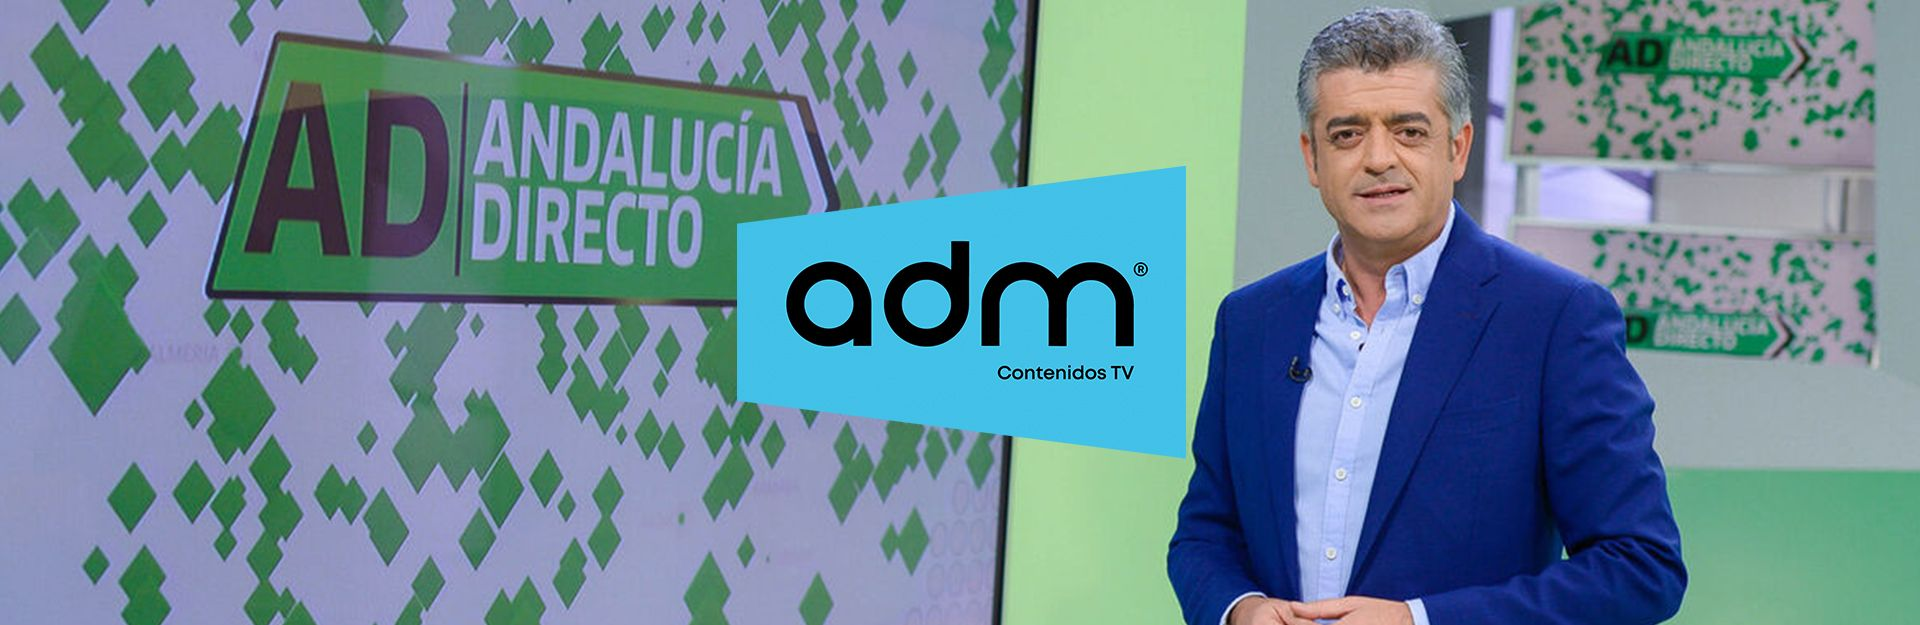 FOTO PORTADA CONTENIDOS TV